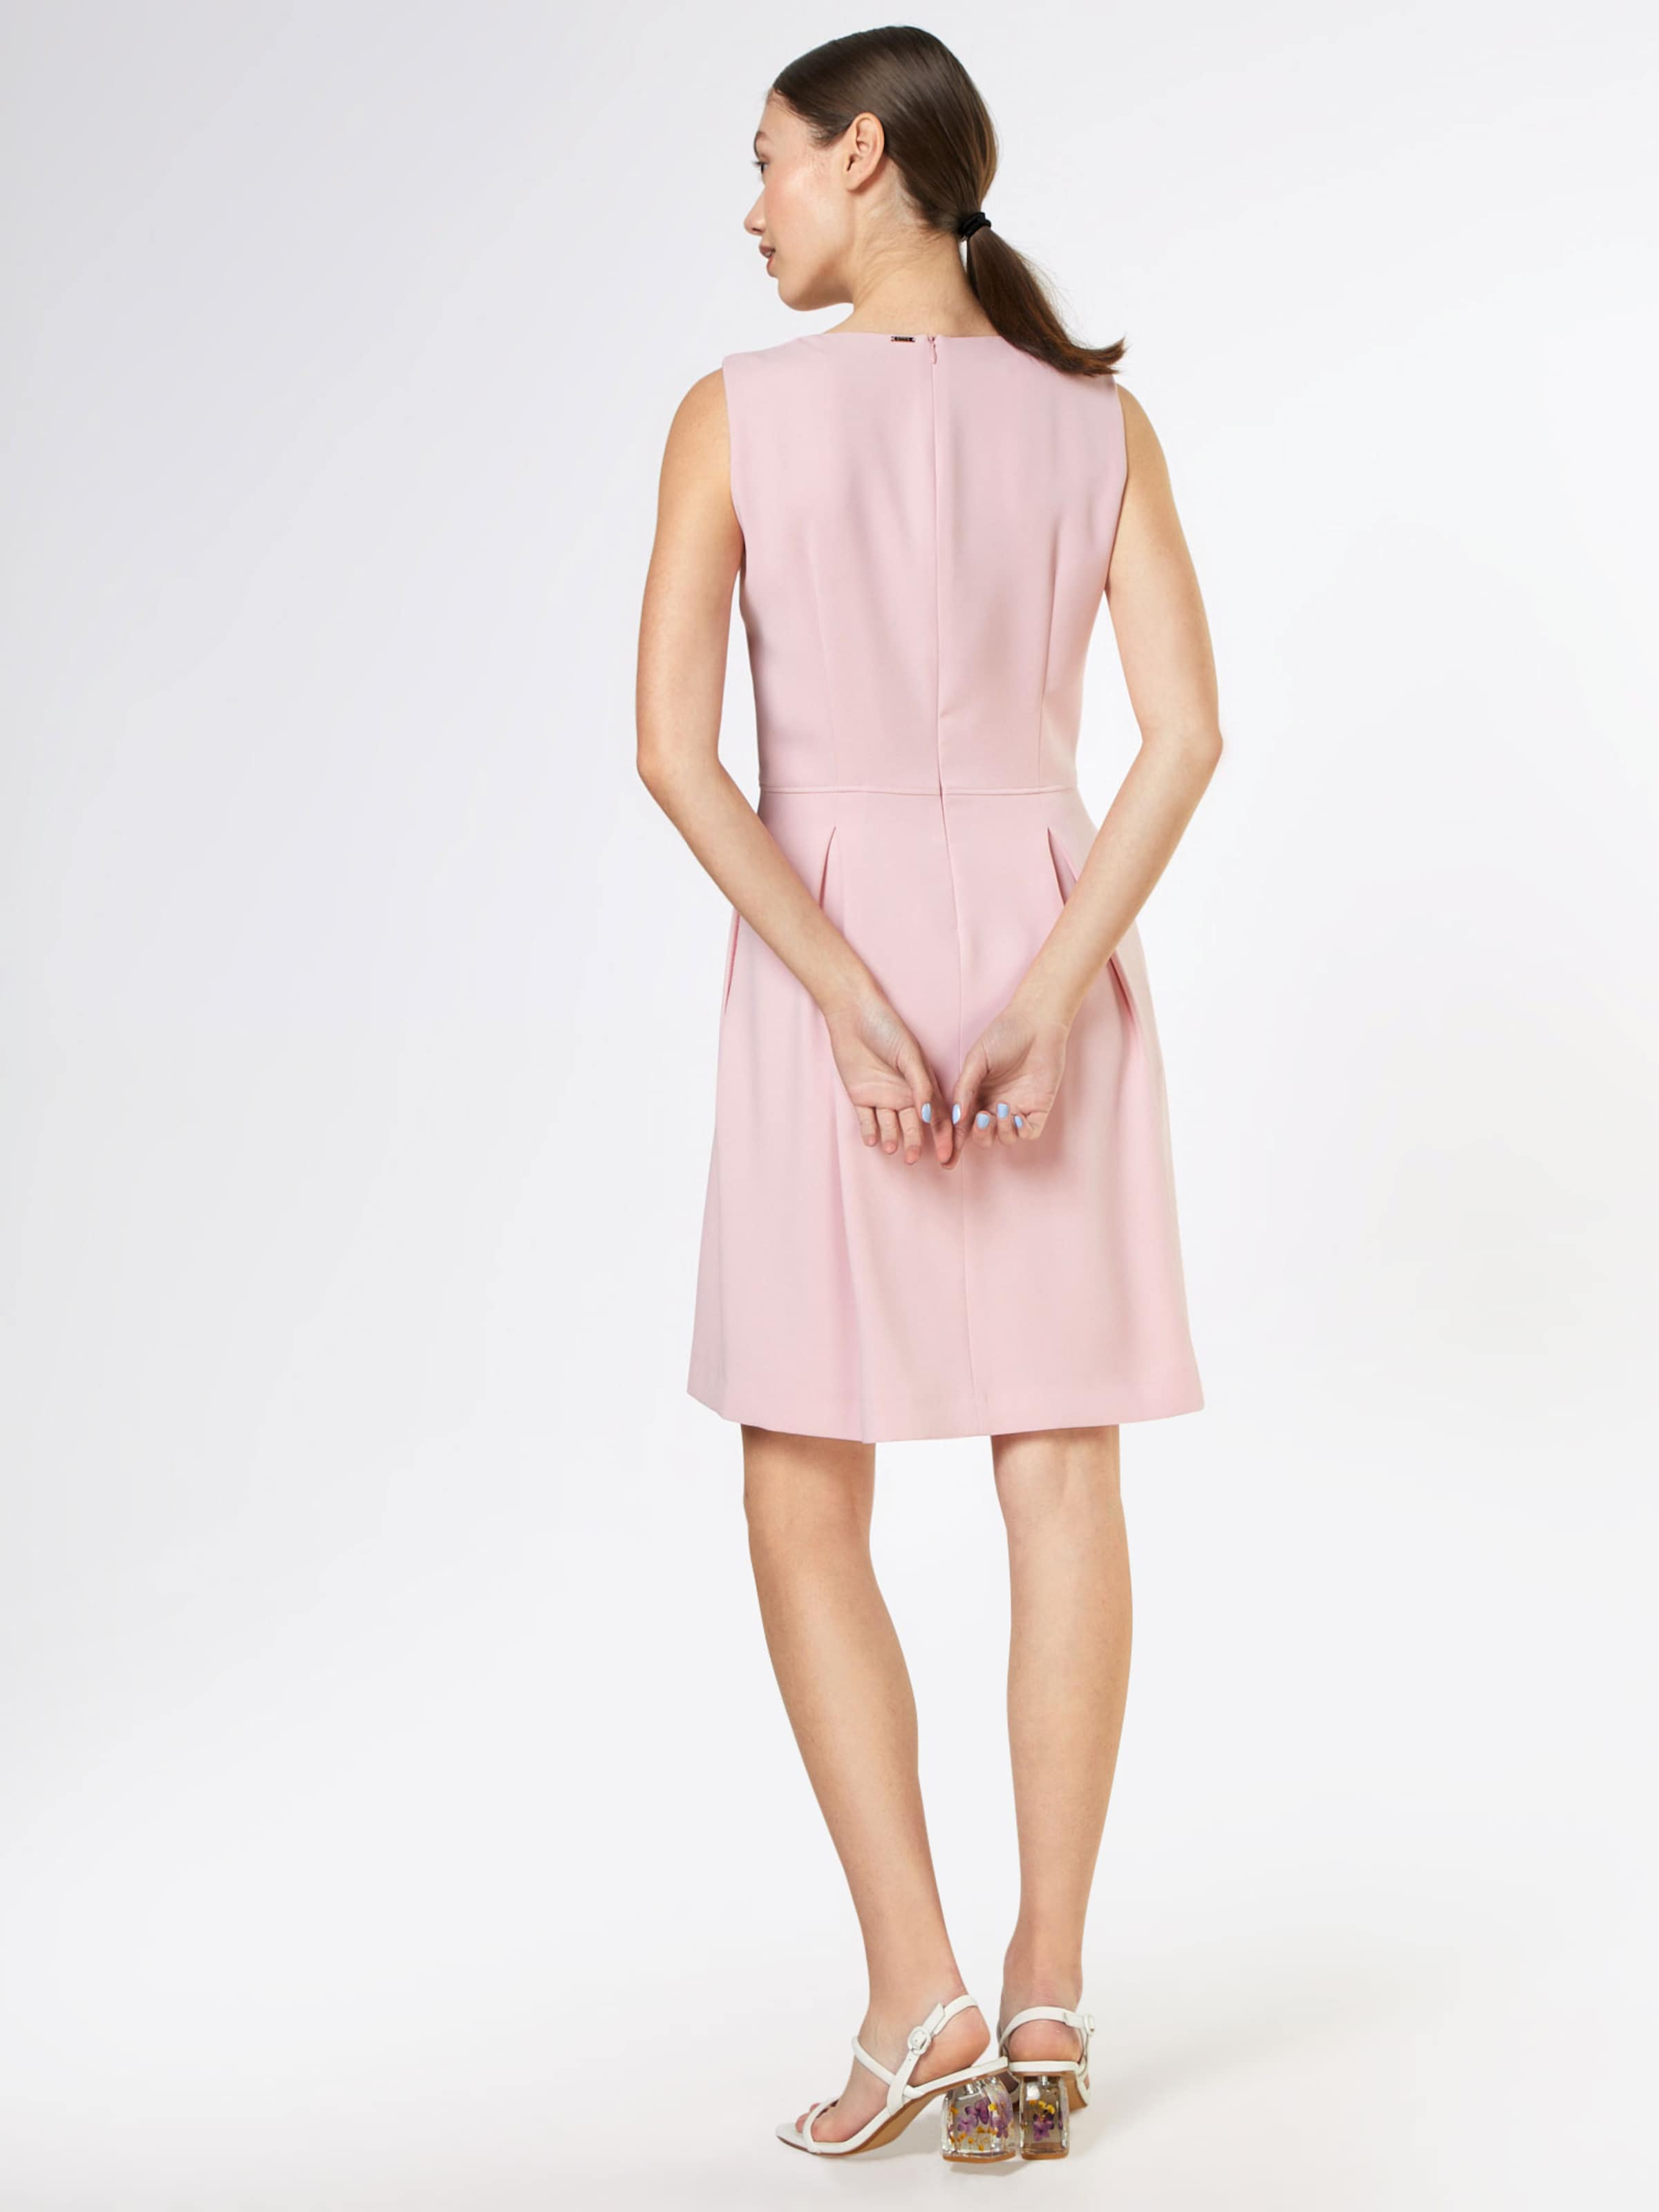 v' En Cocktail Rose Robe Cinque 'ciestron De c3R4q5LAj